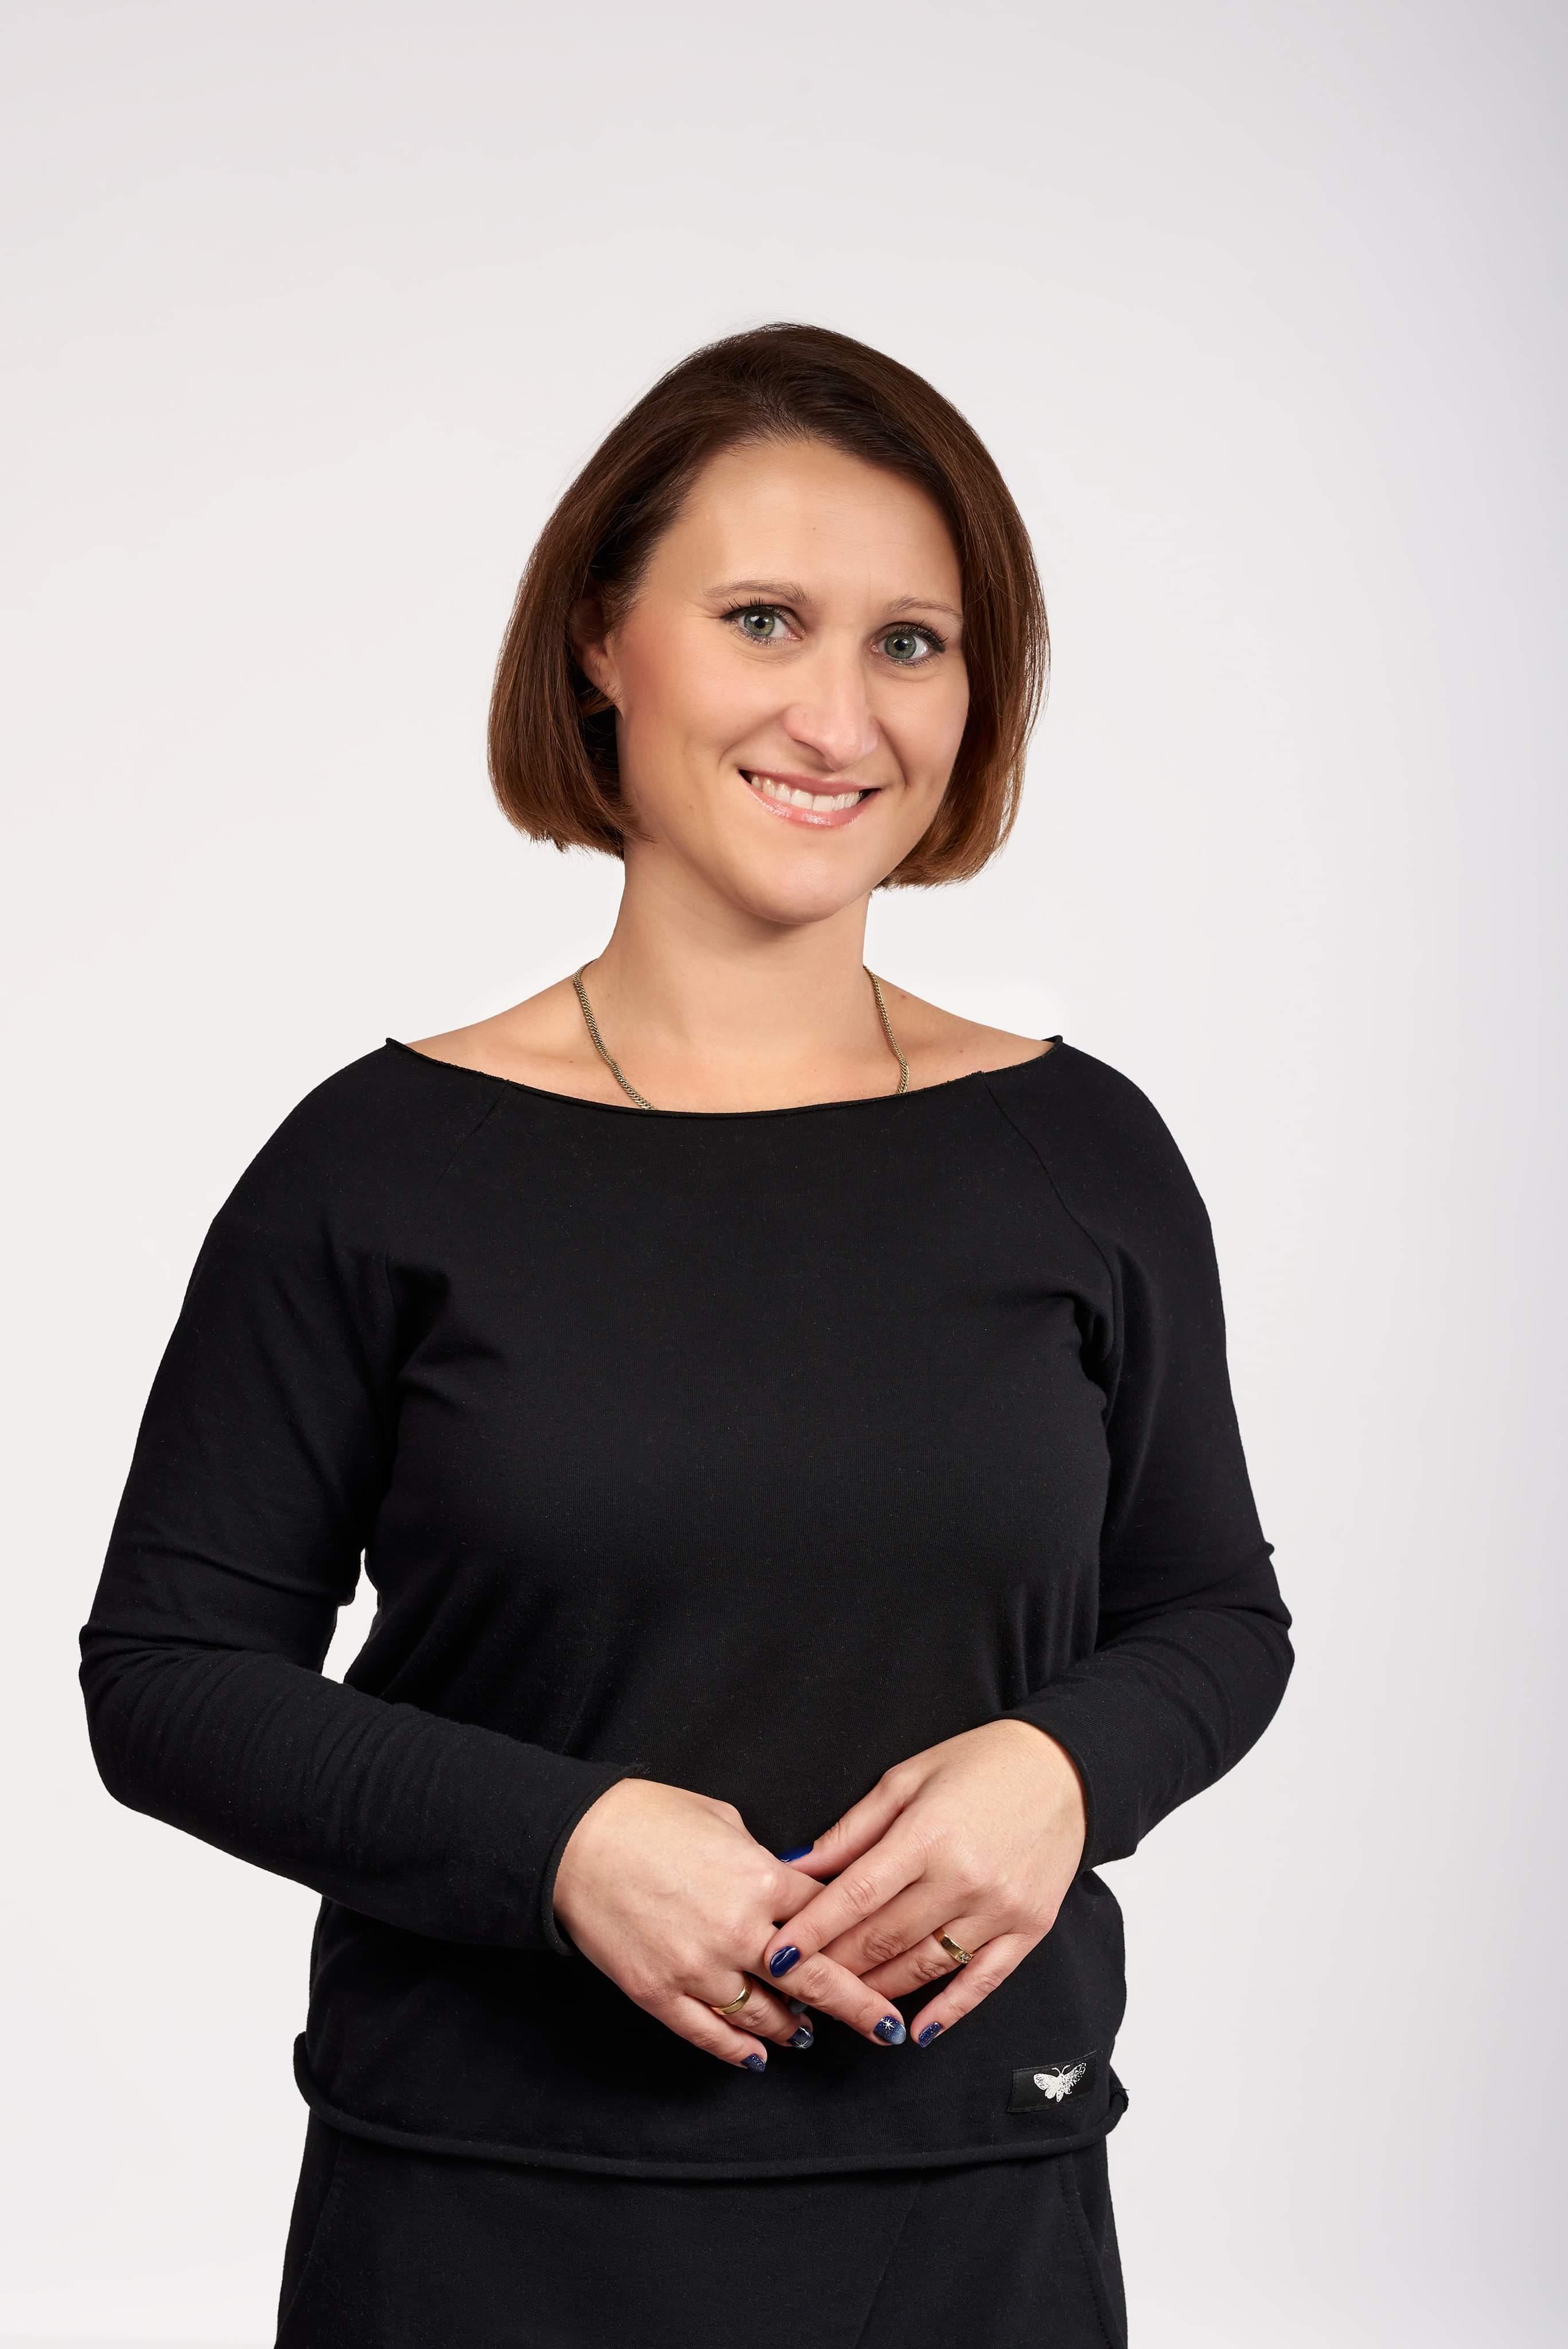 Anna Maj-Łakomska